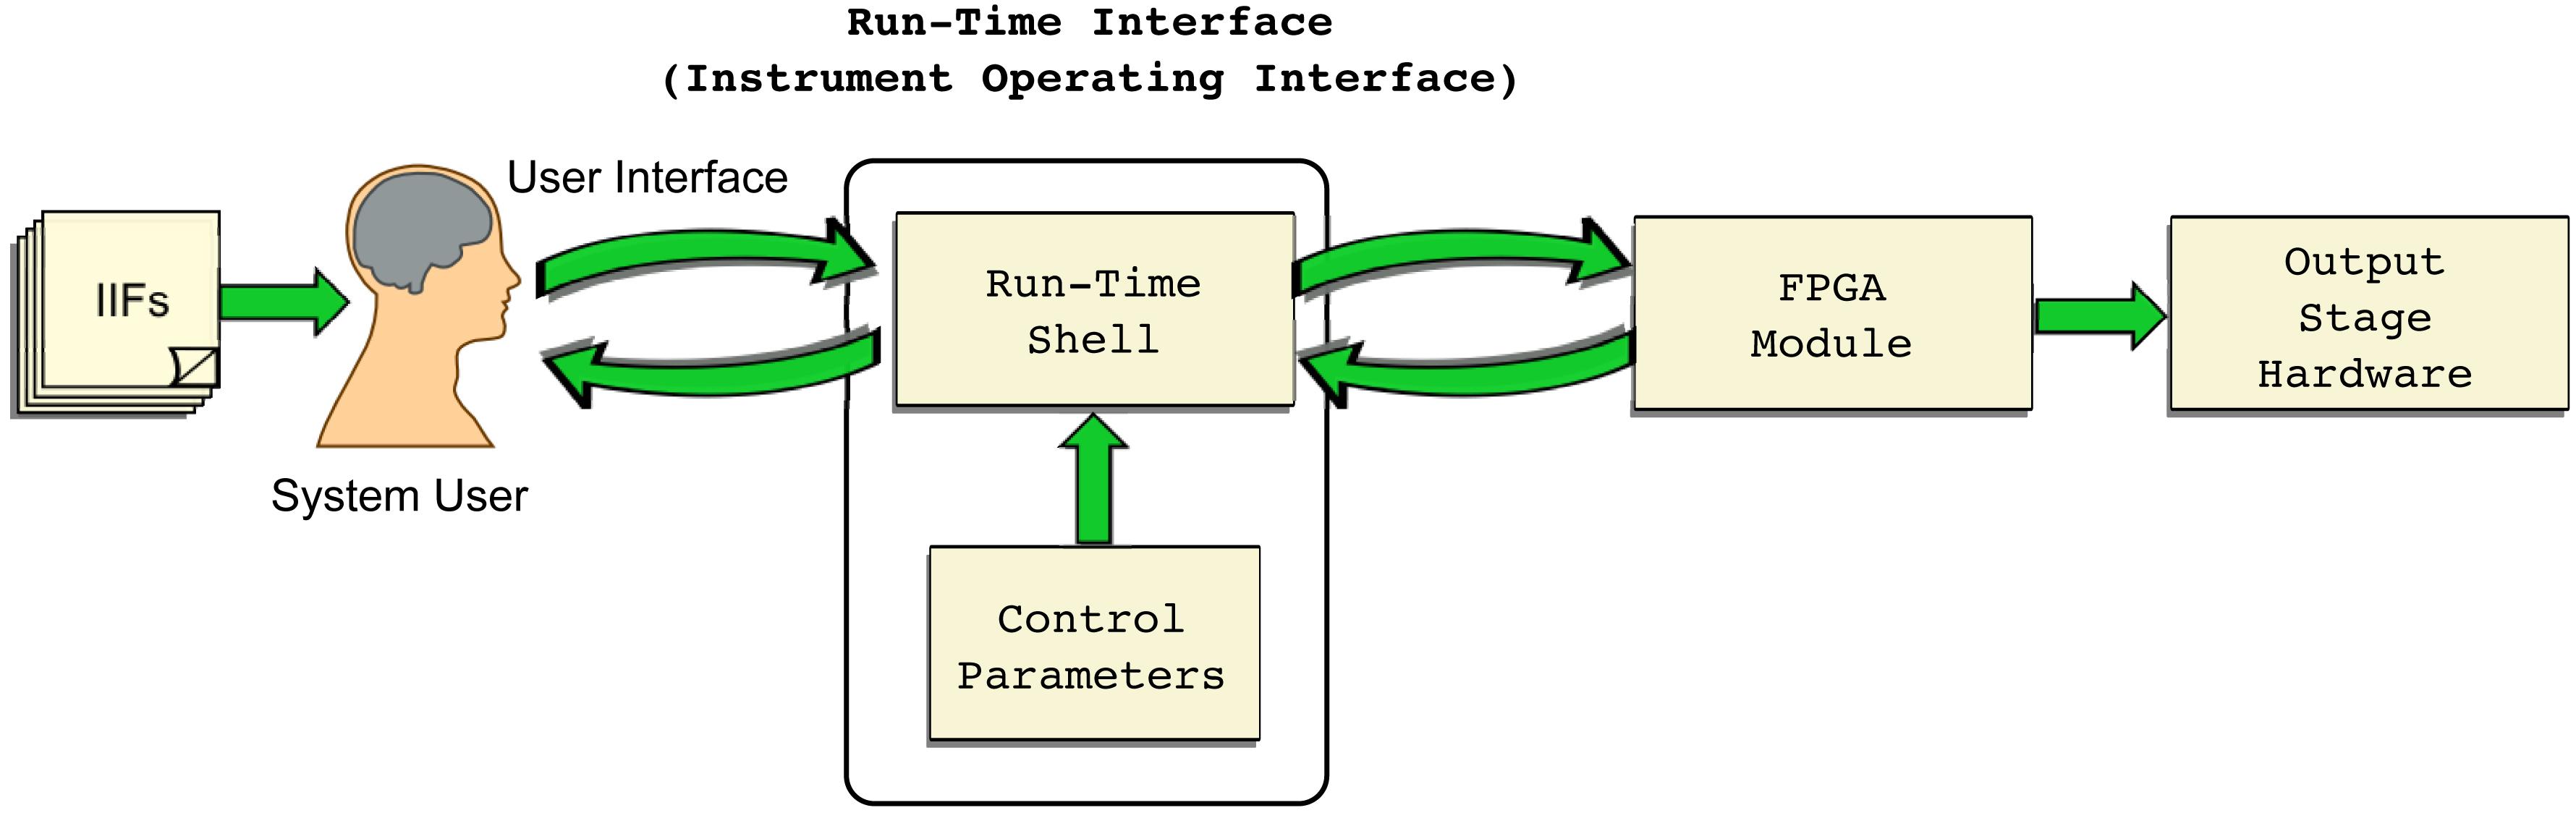 Reconfigurable Virtual Instrumentation Design for Radar